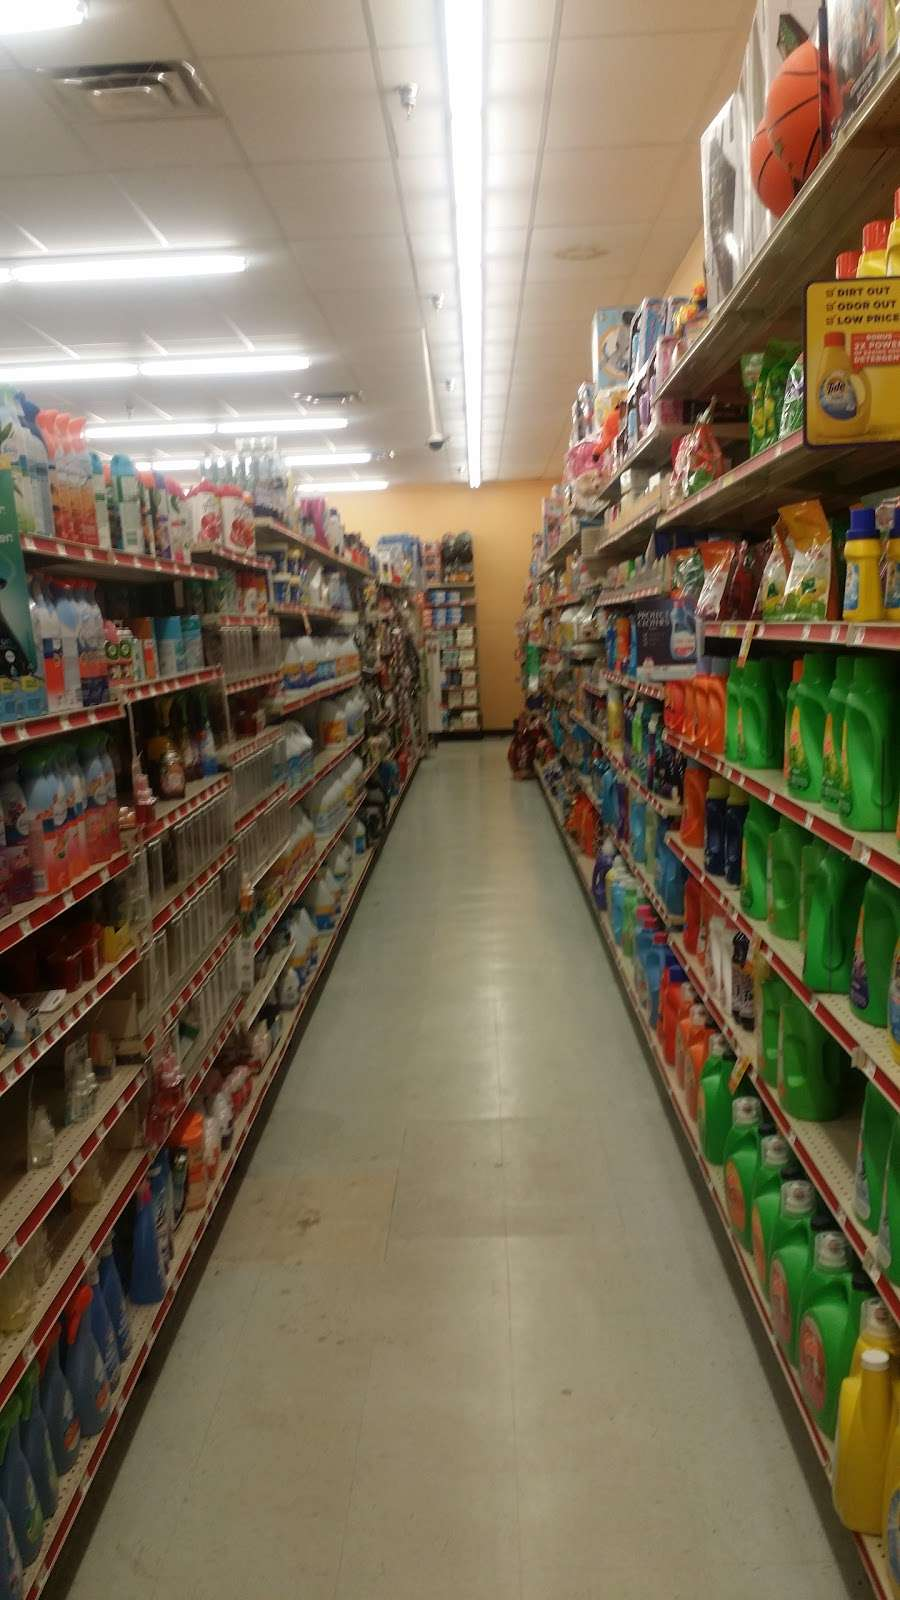 Family Dollar - supermarket  | Photo 1 of 10 | Address: 6611 Marlboro Pike, District Heights, MD 20747, USA | Phone: (301) 736-8300